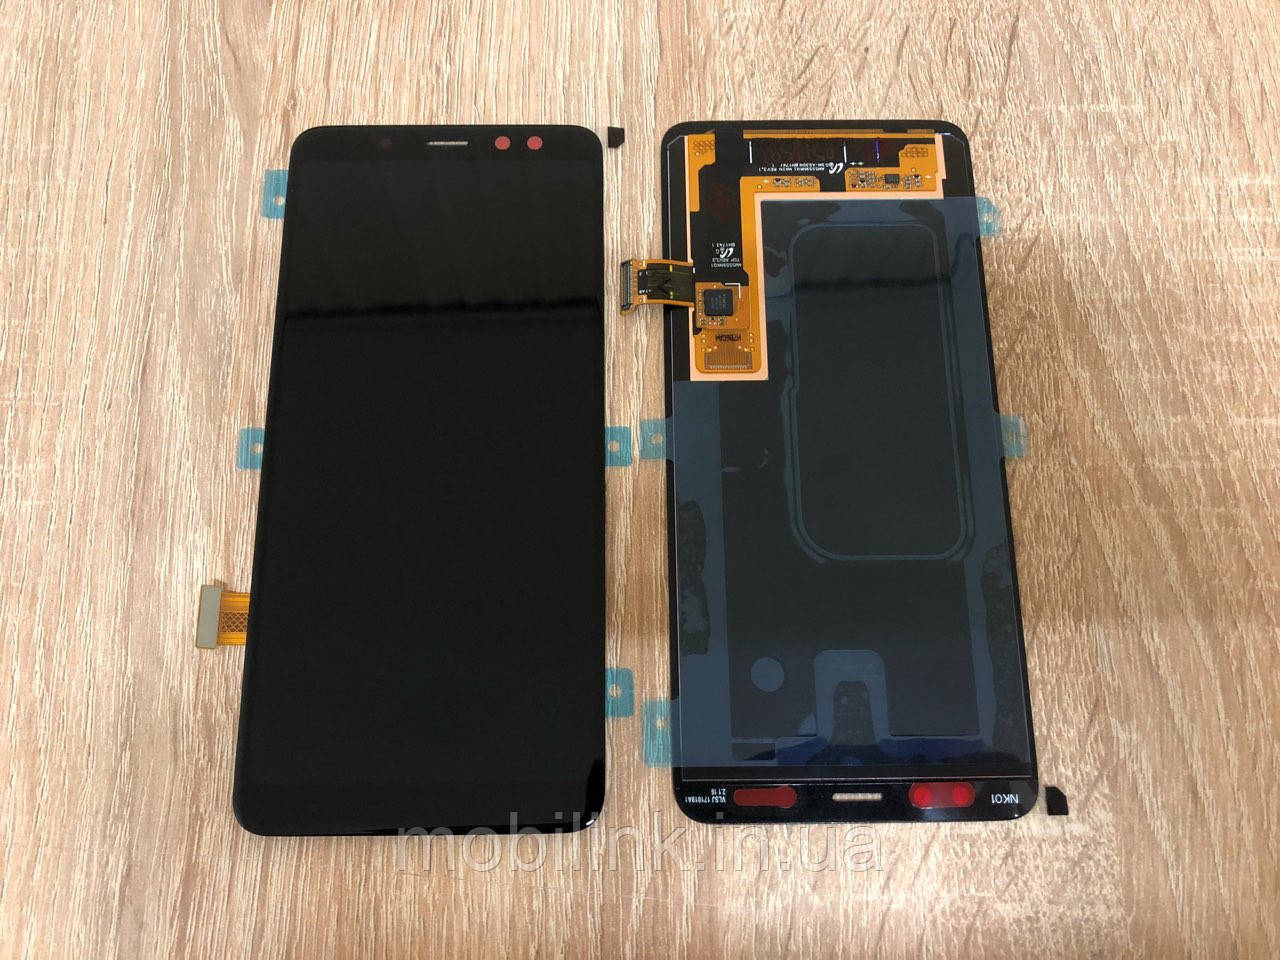 Дисплей на Samsung A530 Galaxy A8(2018) Чёрный(Black),GH97-21406A, Super AMOLED!